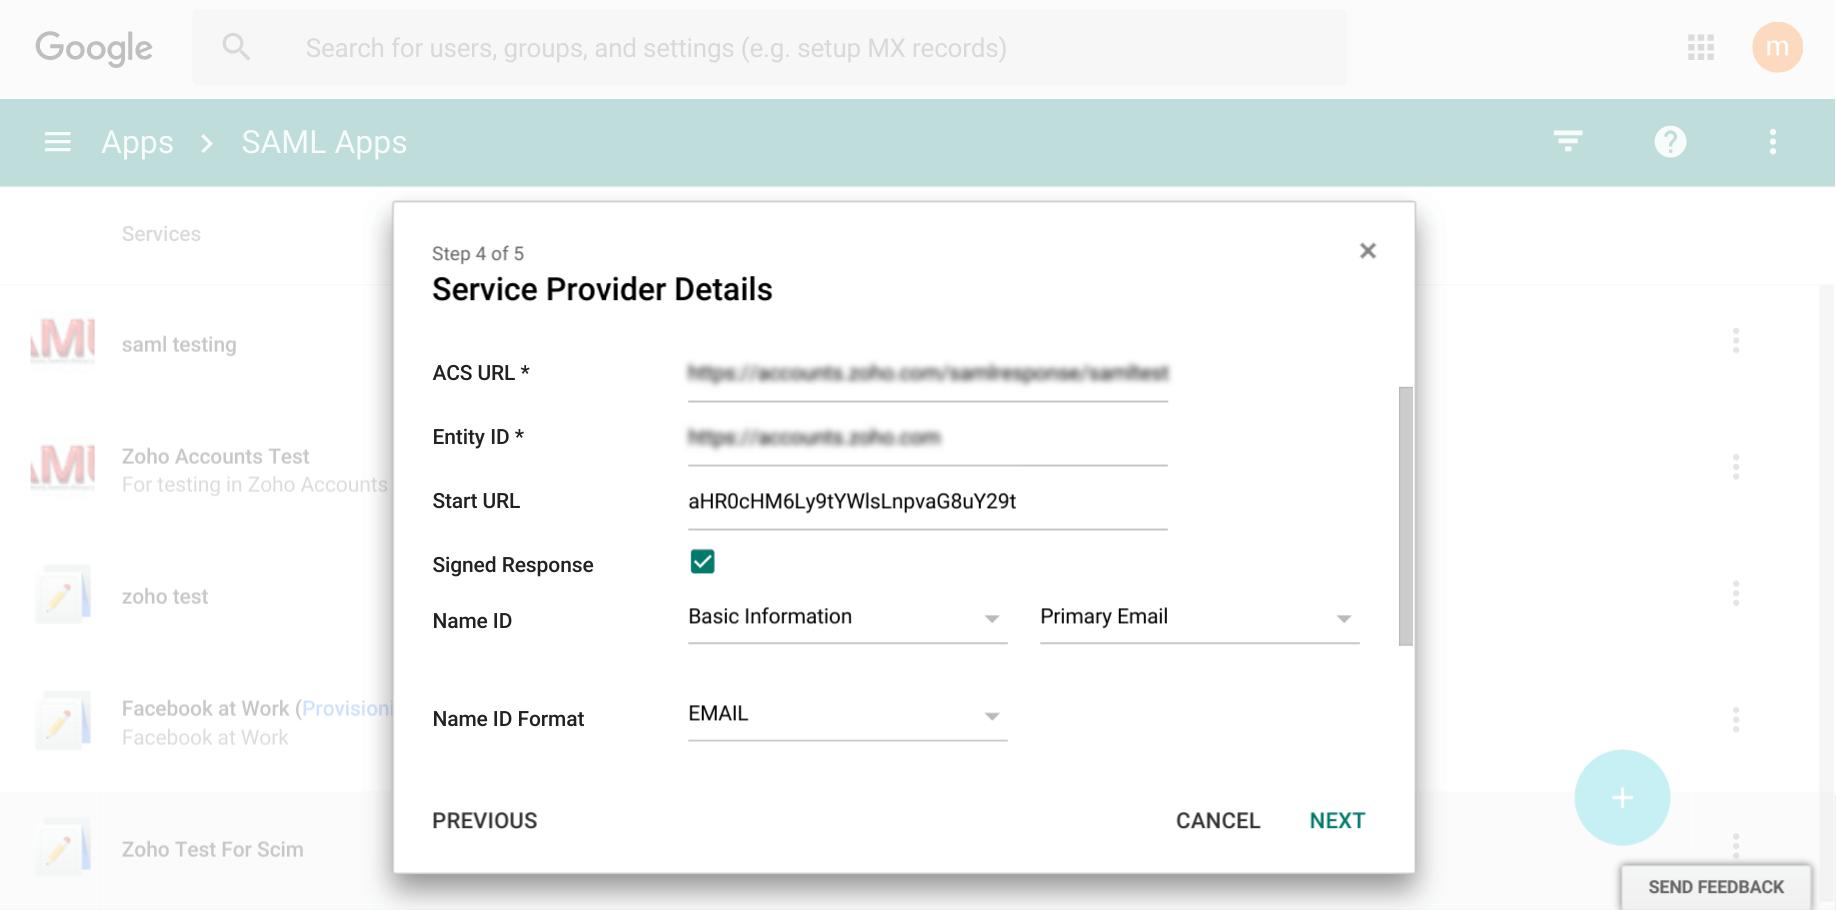 Google service provider